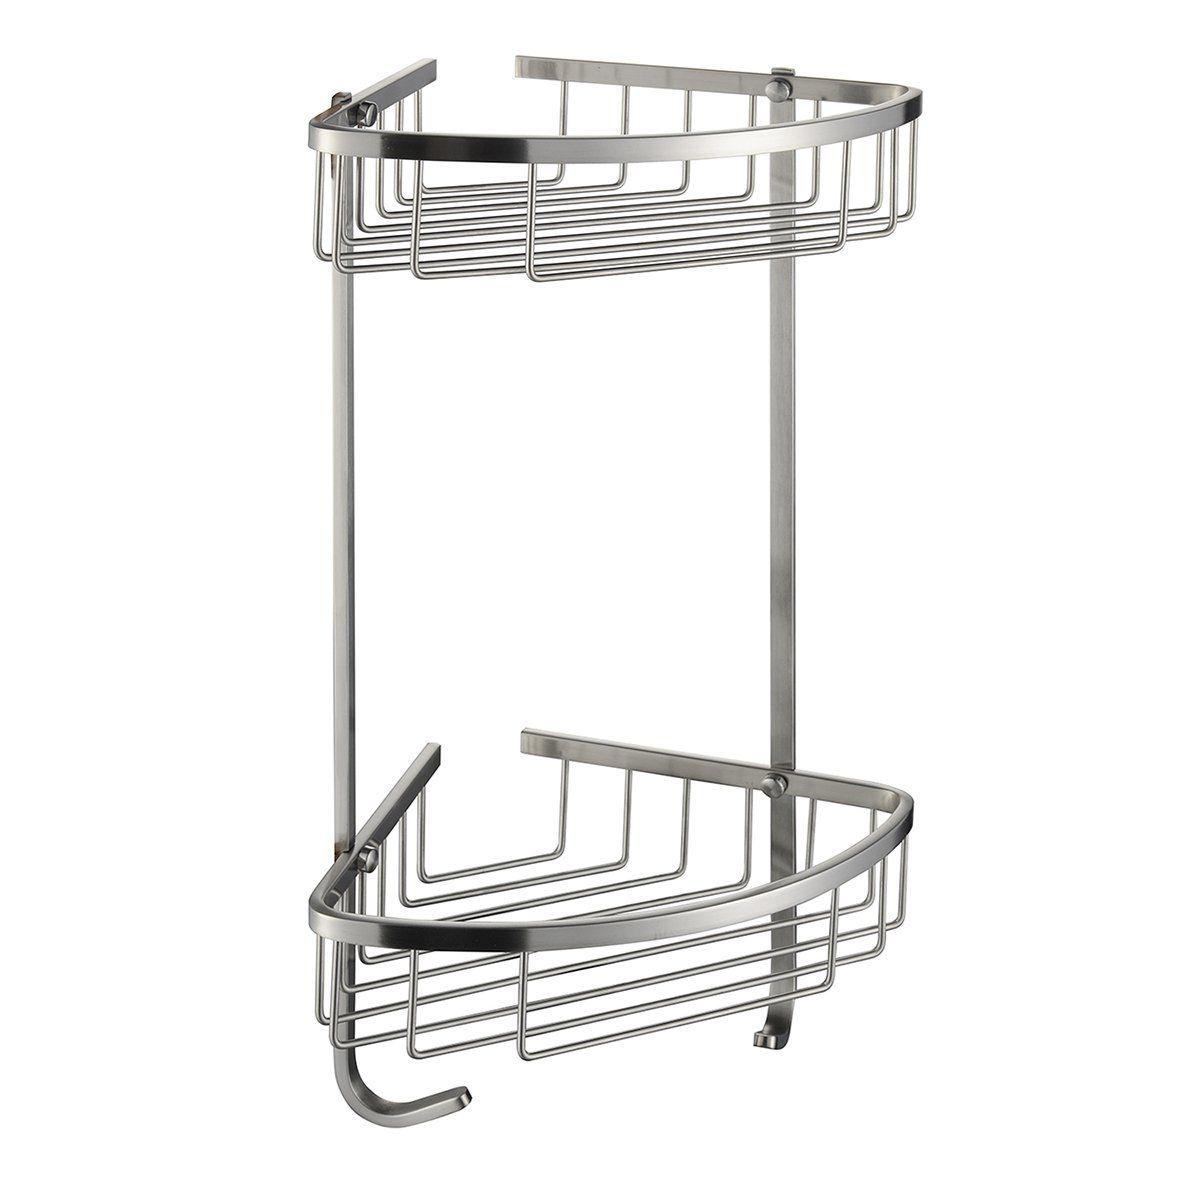 SUS 304 Stainless Steel Shower Caddy Basket 2-Tier Triangular Wall ...